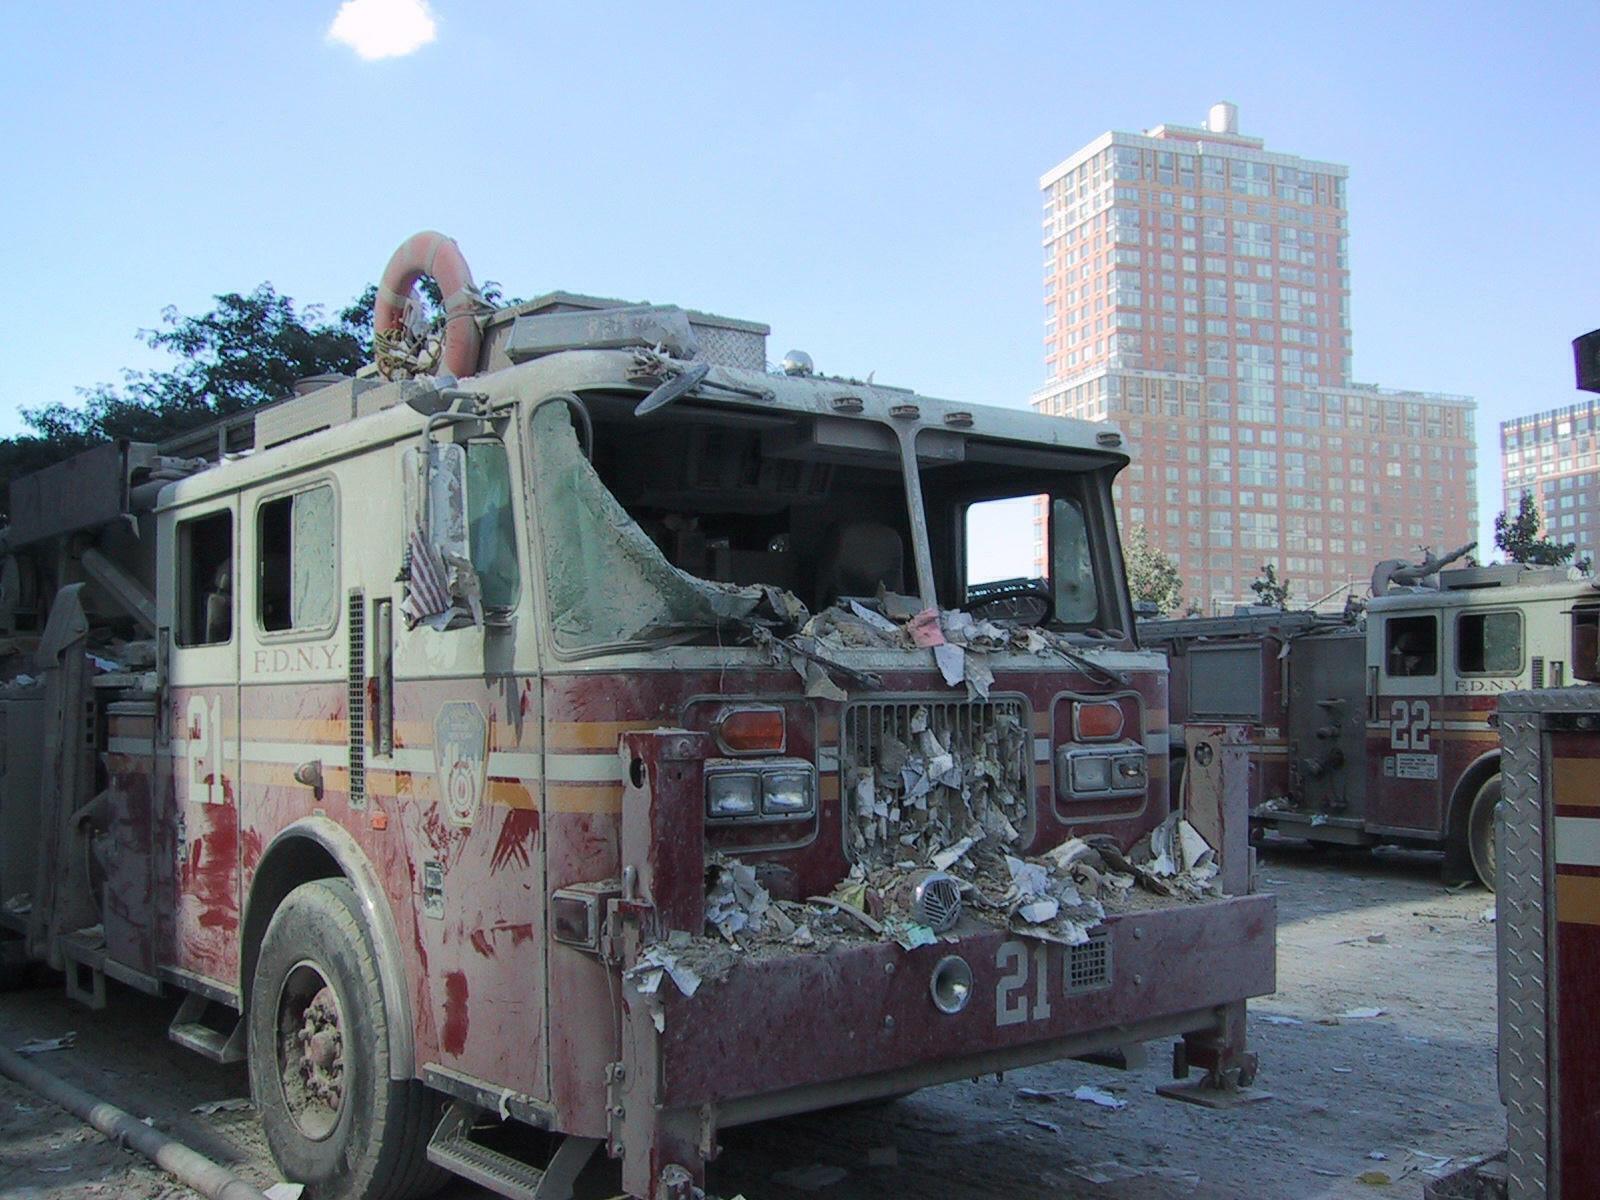 d43f9ebc07e233c6f000_firetruck21.JPG